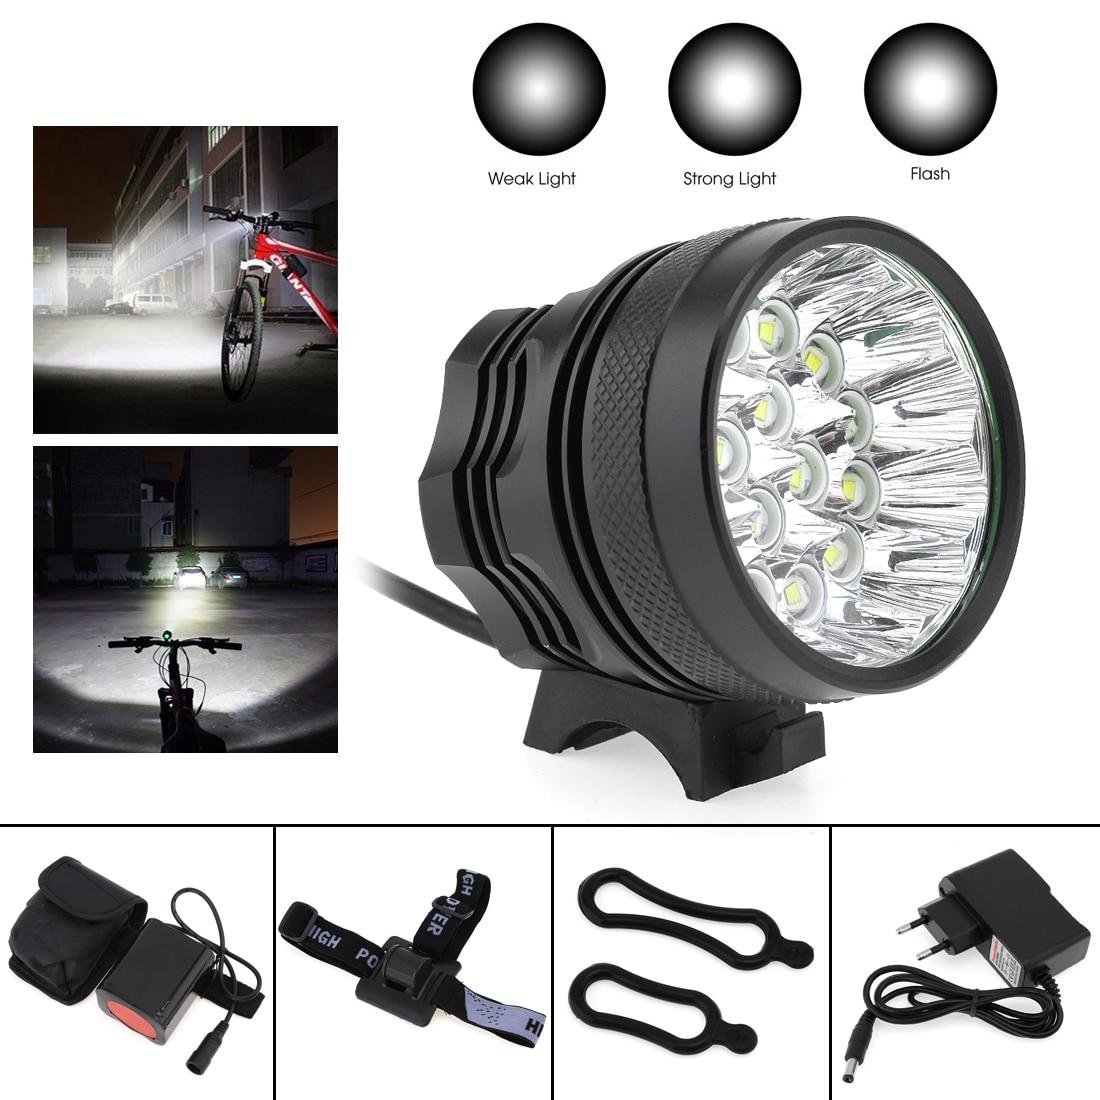 16 x XM-L T6 LED 3 modes Bicycle Lamp Bike Light Headlight Cycling Torch with 8.4V 6400mAh Battery Set zinuo 3 x cree xm l t6 led bicycle bike headlight head light lamp torch flashlight